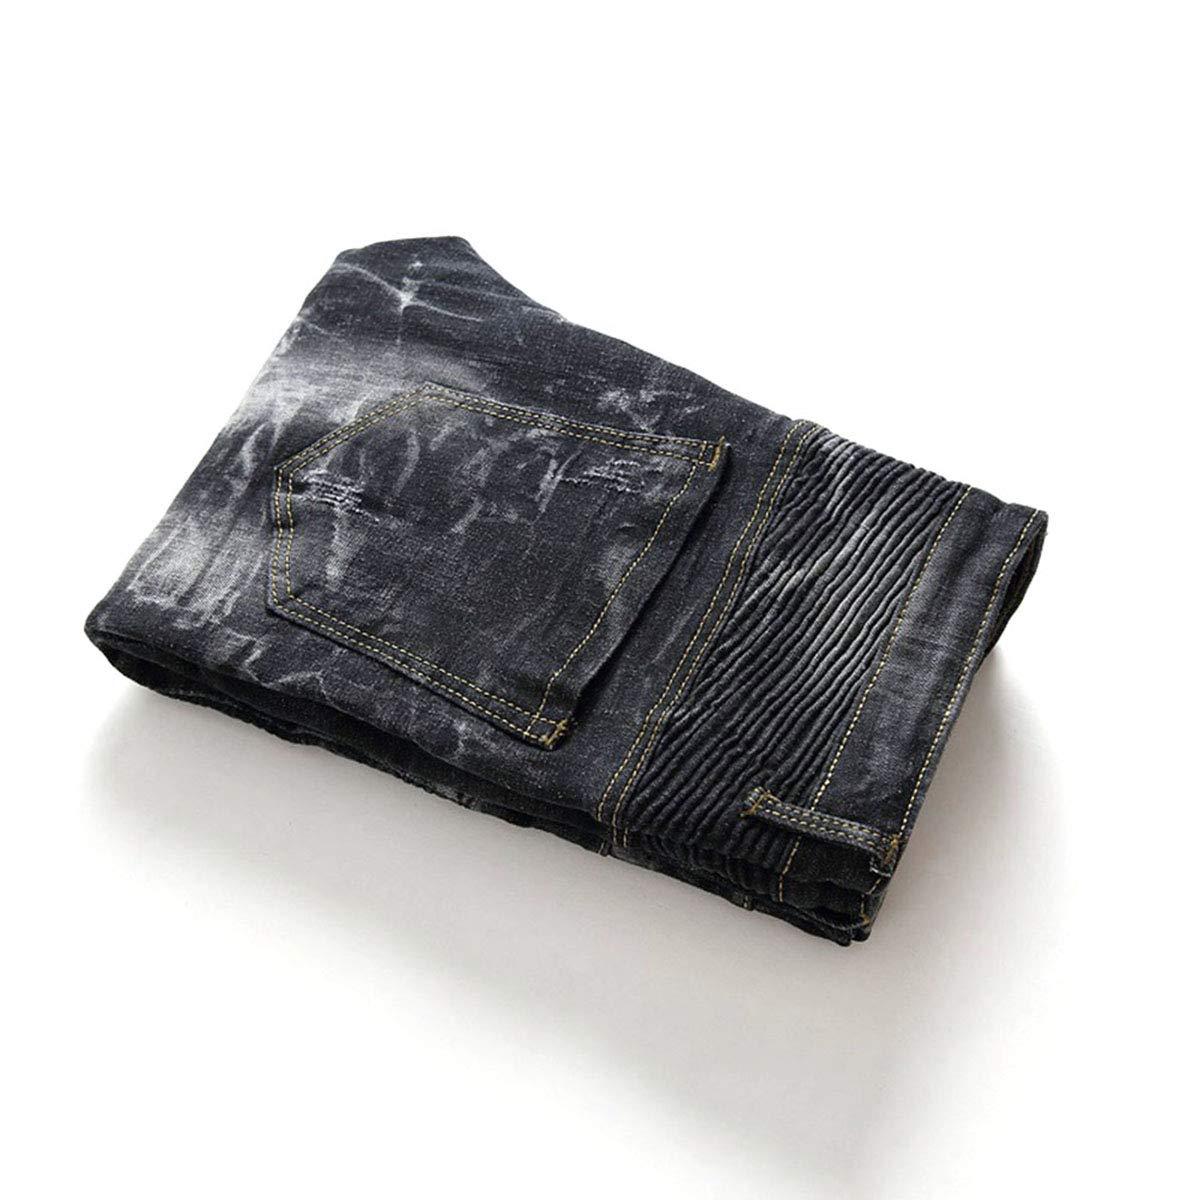 Black Mens Stylish Slim Straight Jeans Regualr Fit Washed Denim Jeans with Multi-Zipper Decor Size 34